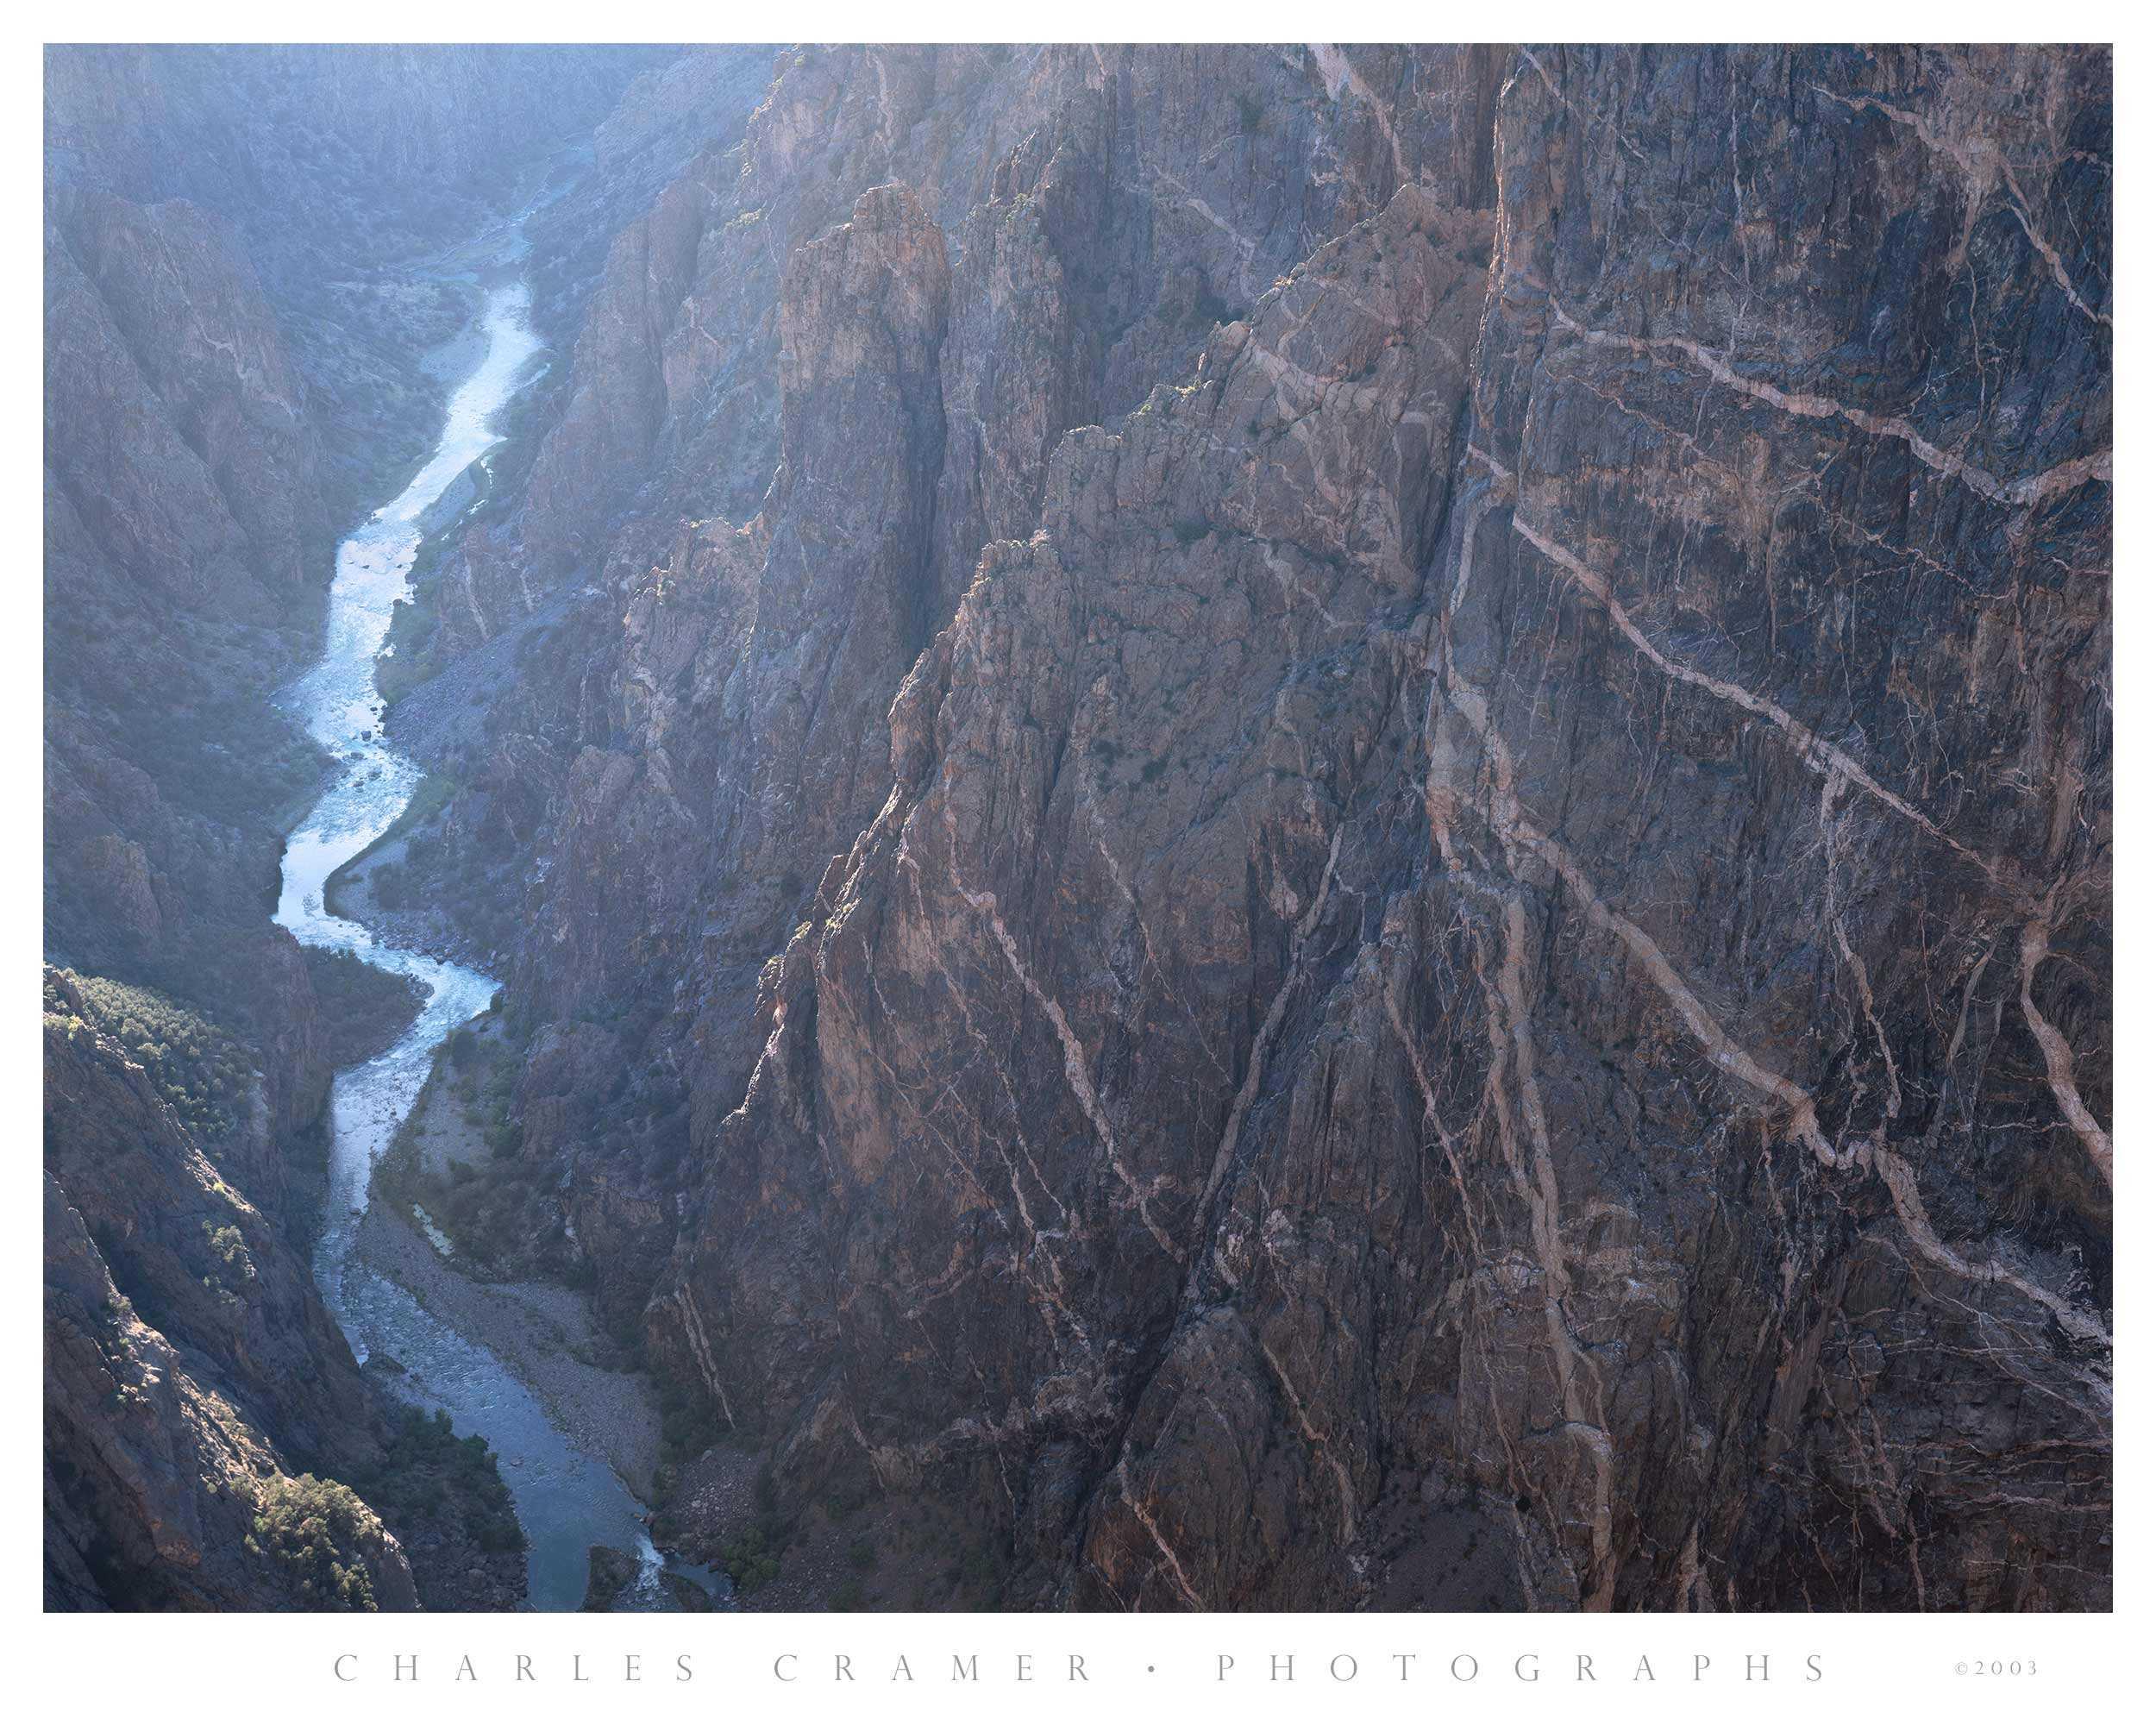 Gunninson River, Black Canyon of the Gunnison